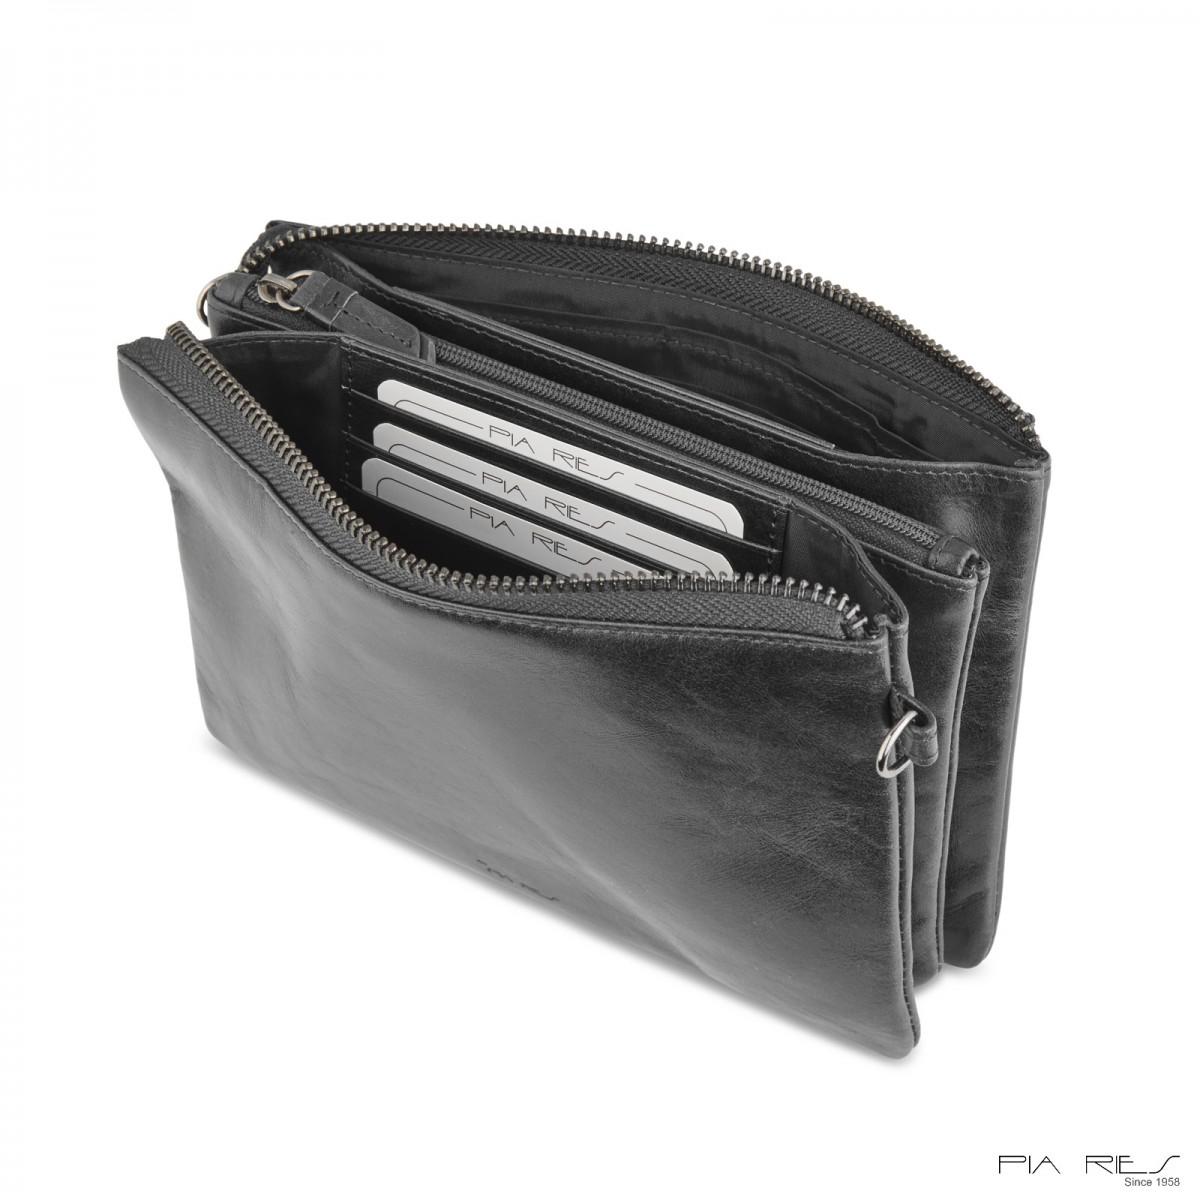 Clutch taske i Rain Crunch skind stor-310